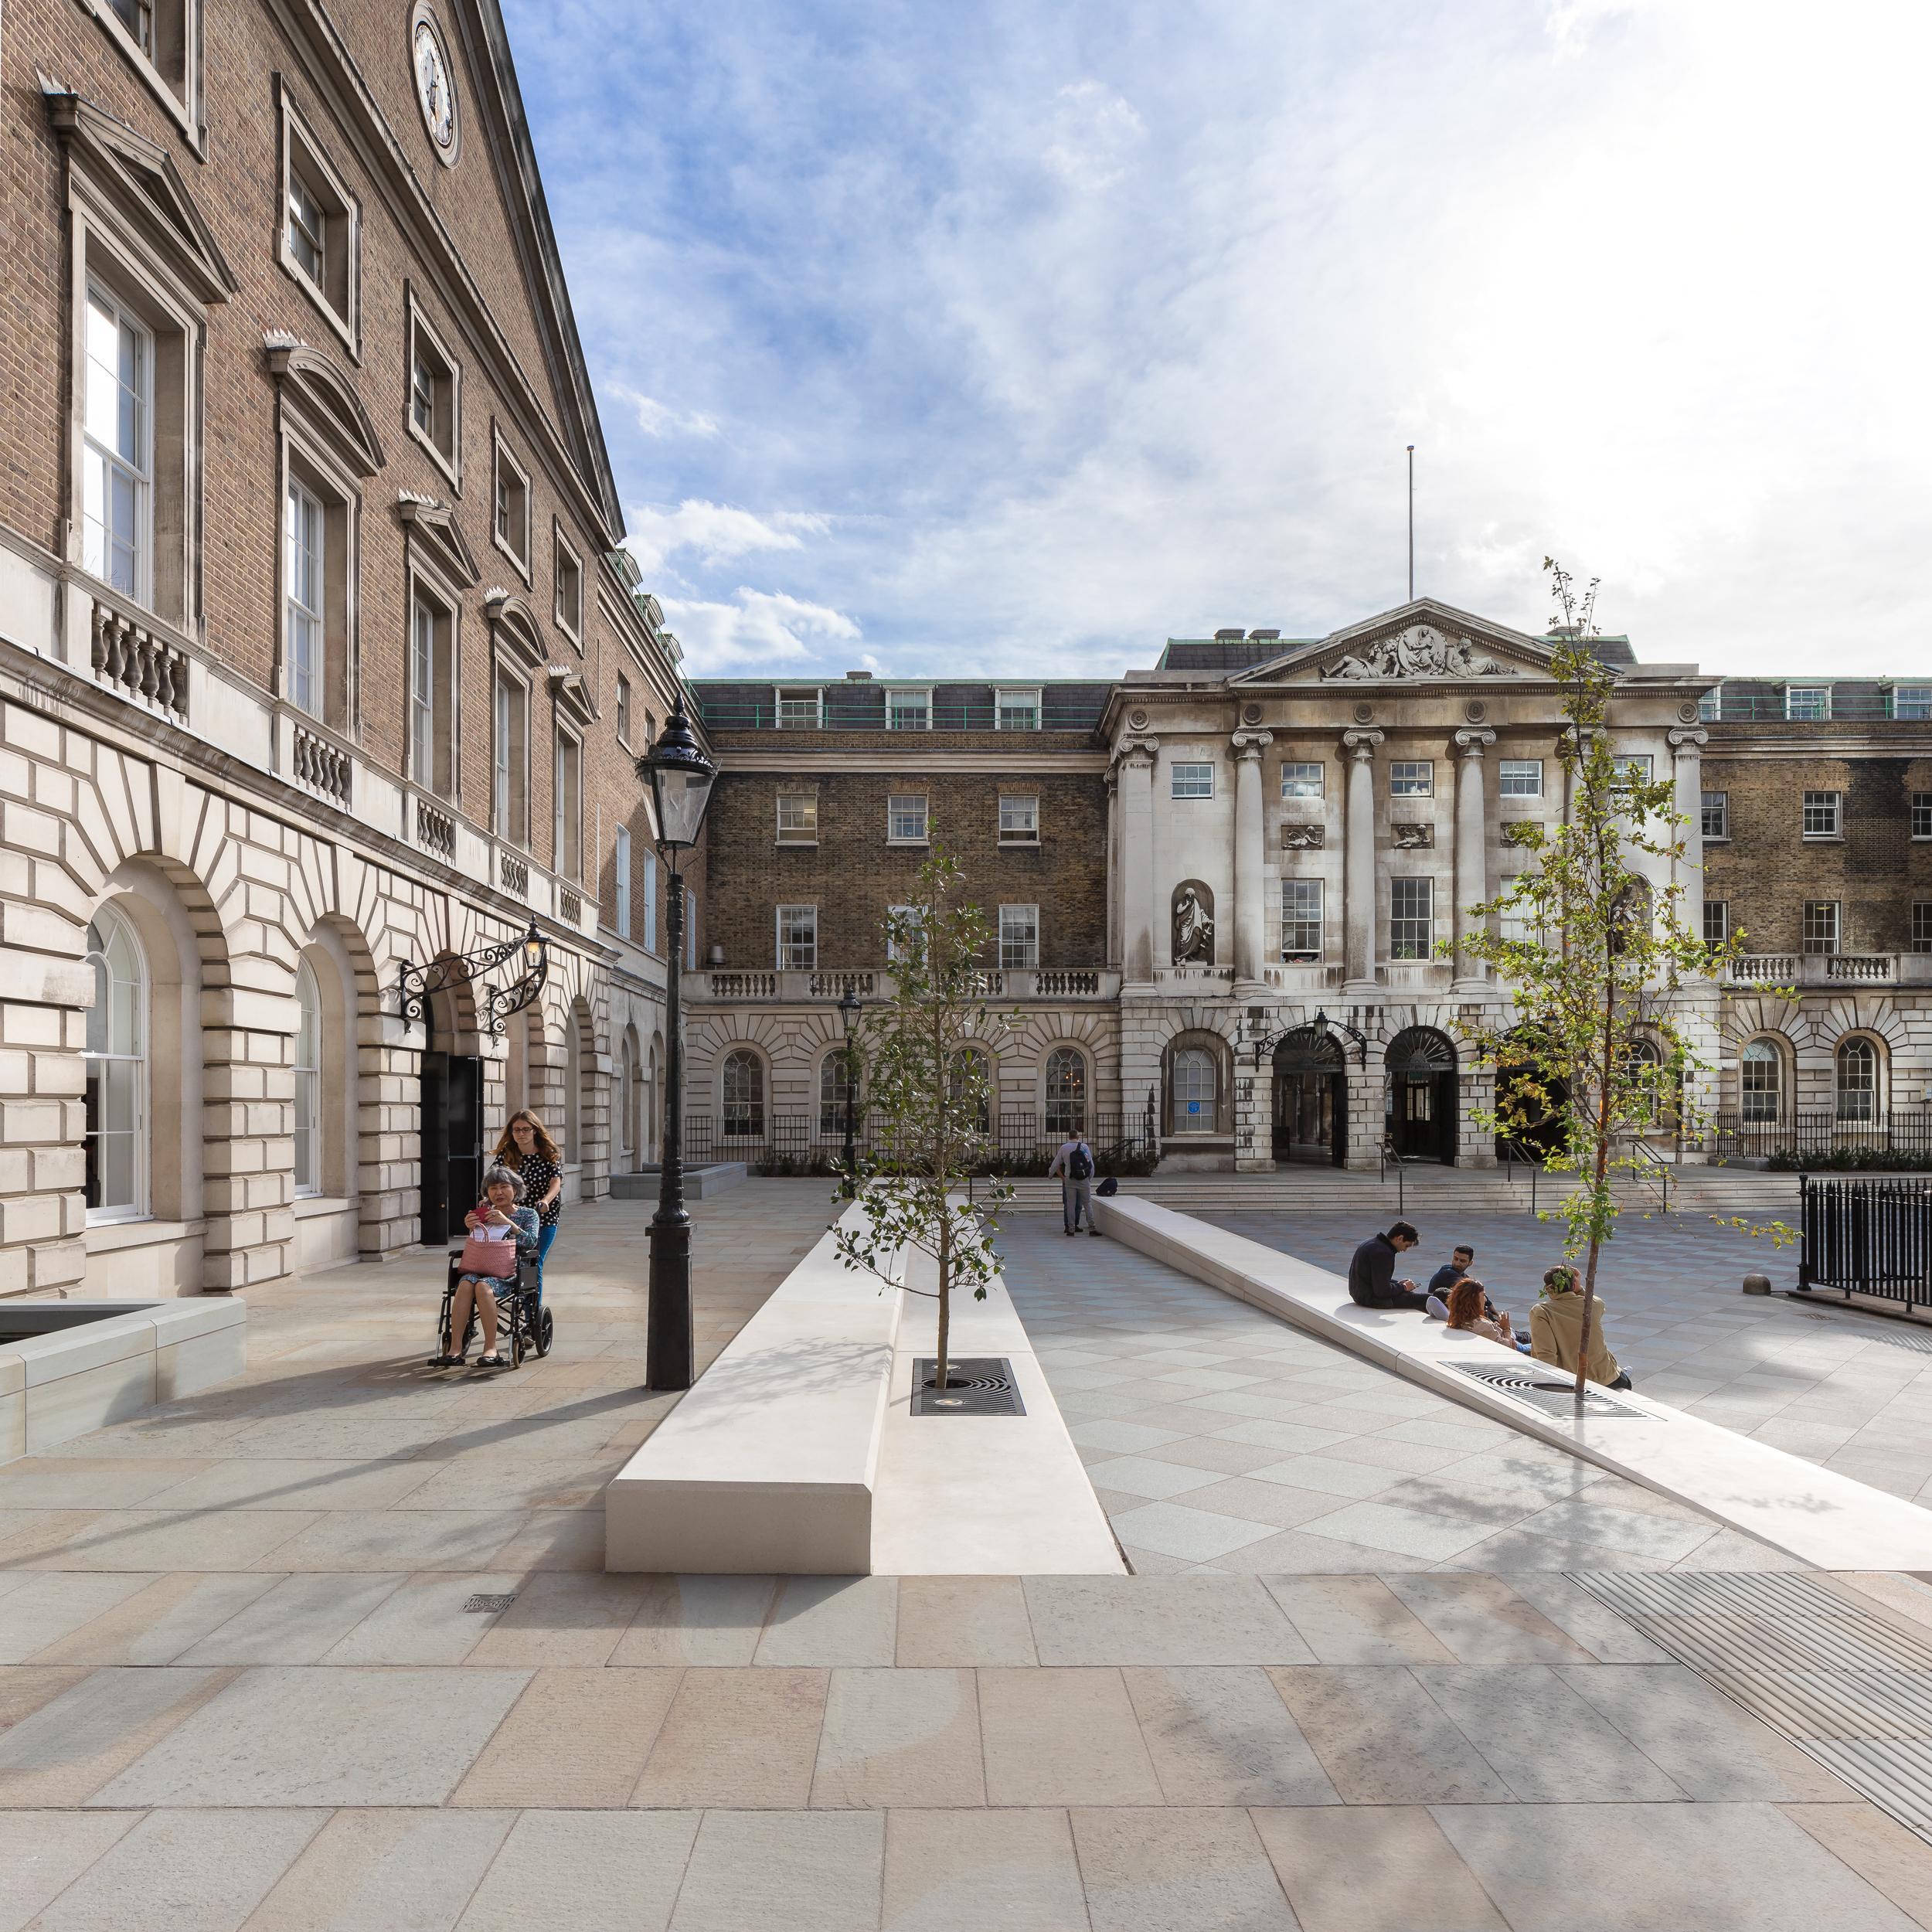 Gallery: Science Gallery London